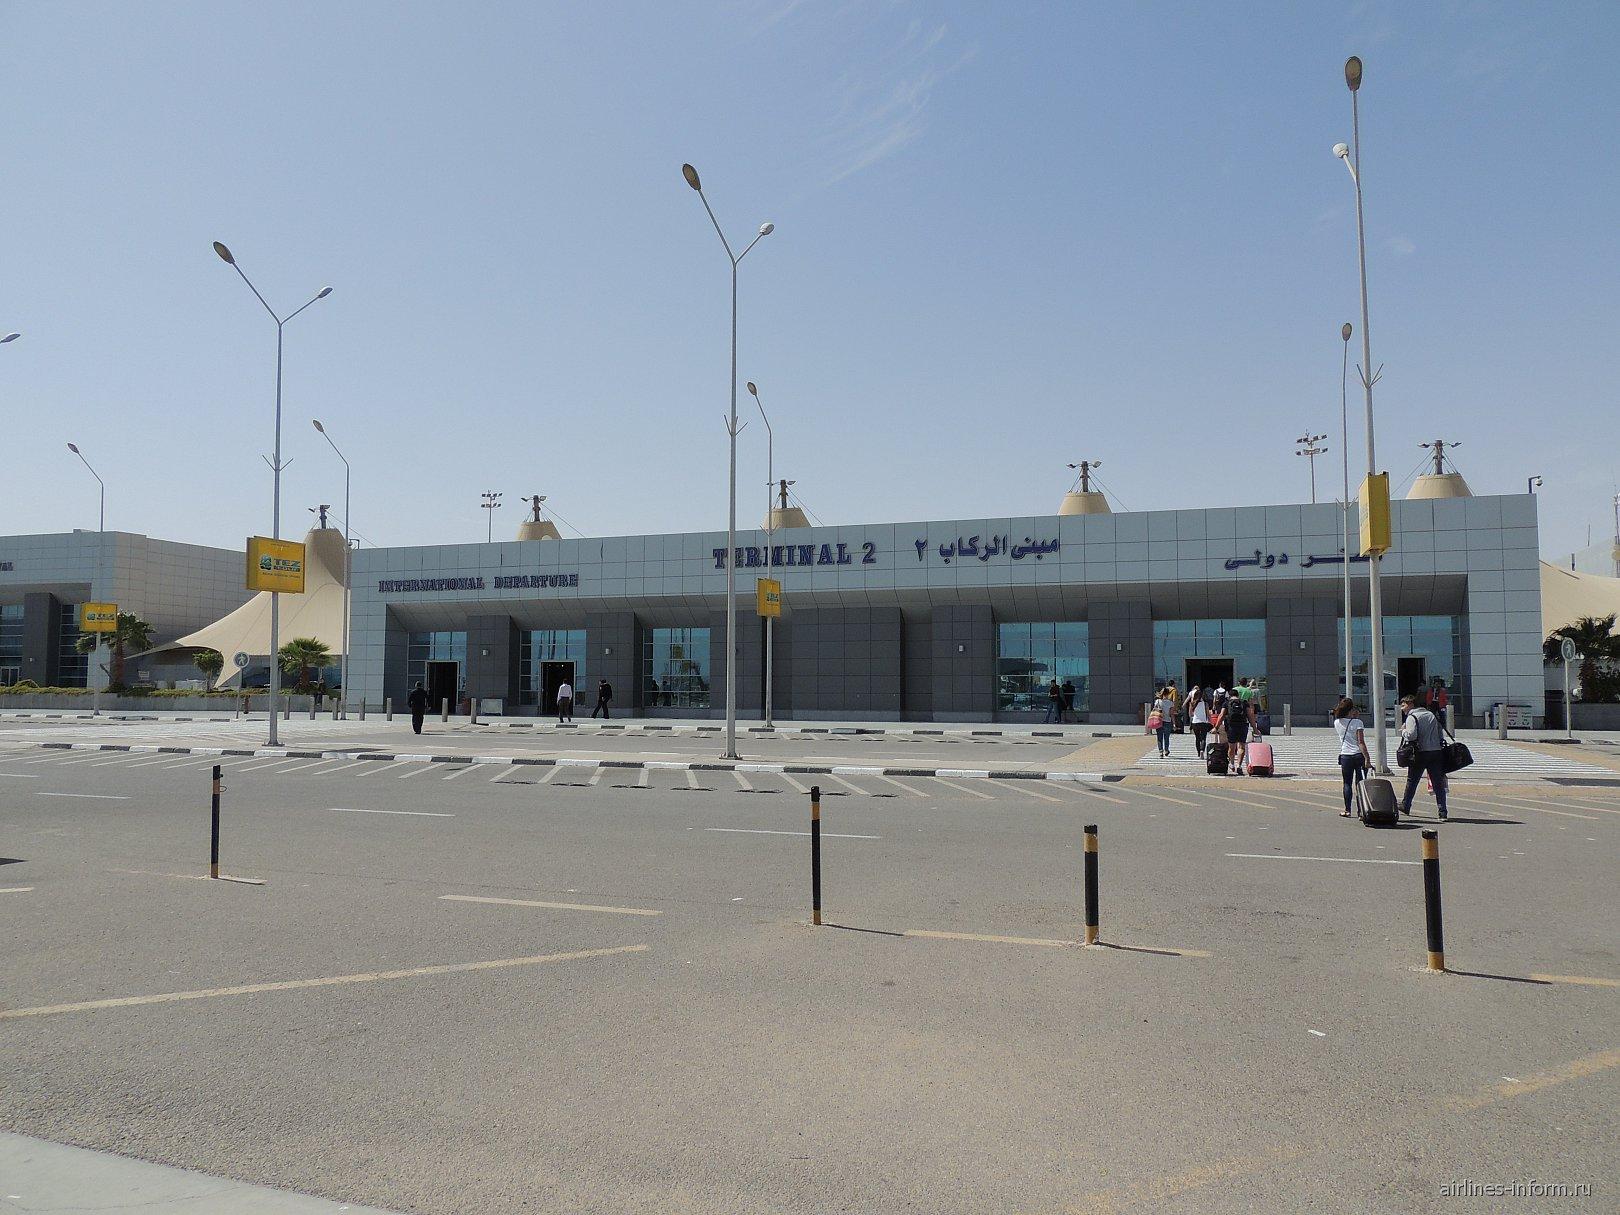 Вход в терминал 2 аэропорта Хургада